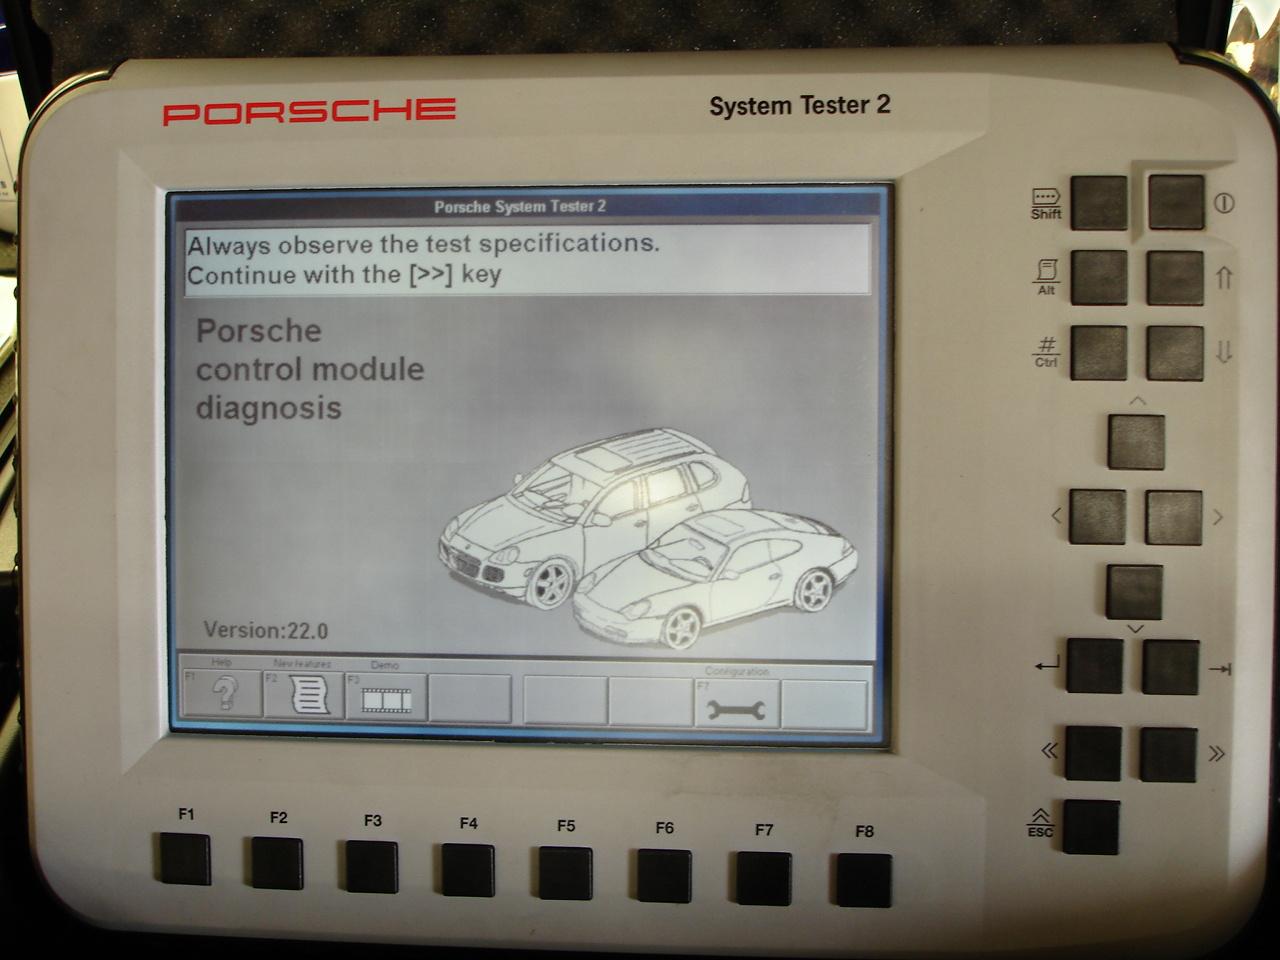 Porsche PST 2.3